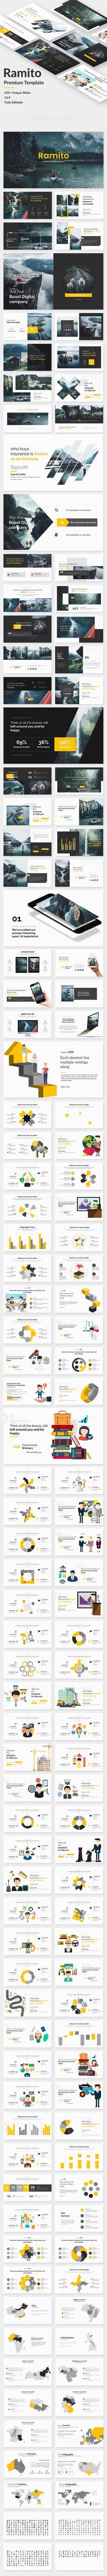 Ramito Creative Powerpoint Template - Creative PowerPoint Templates